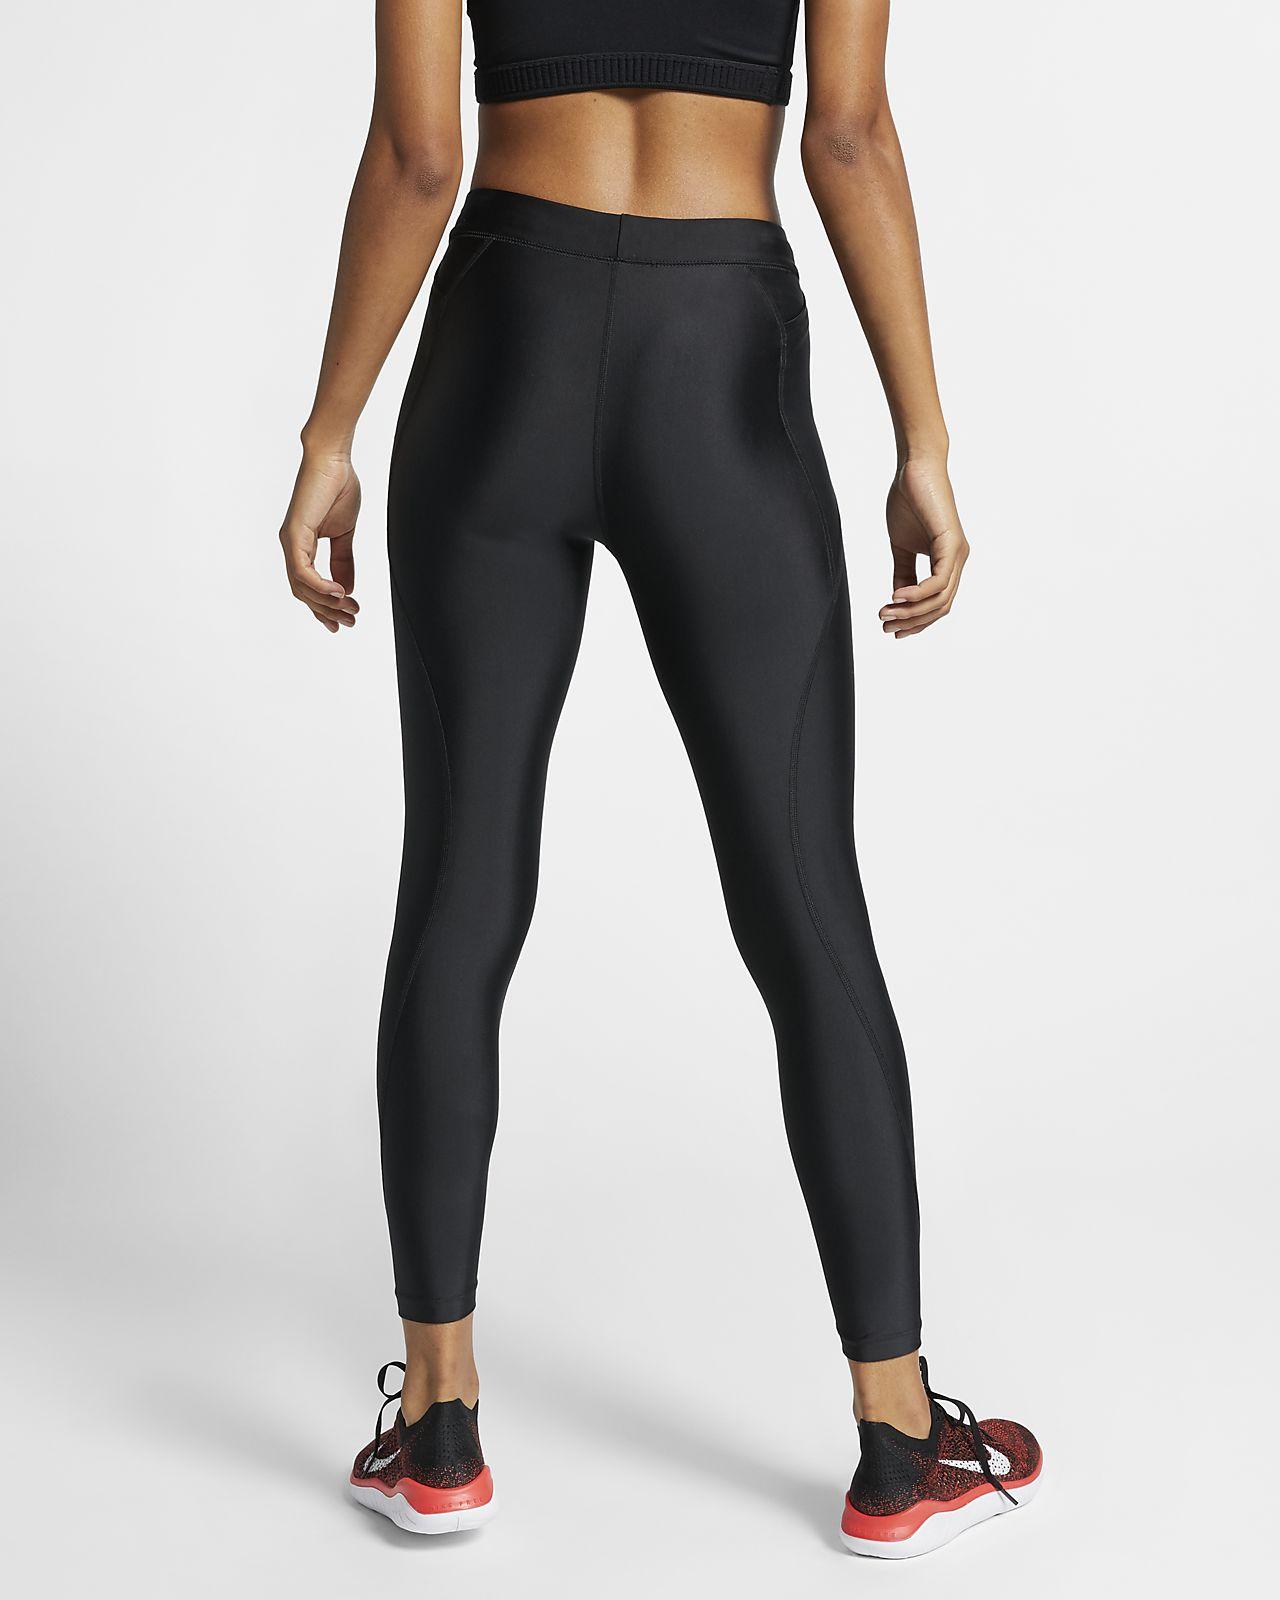 e78f95e516 Nike Speed Women's 7/8 Tights. Nike.com GB